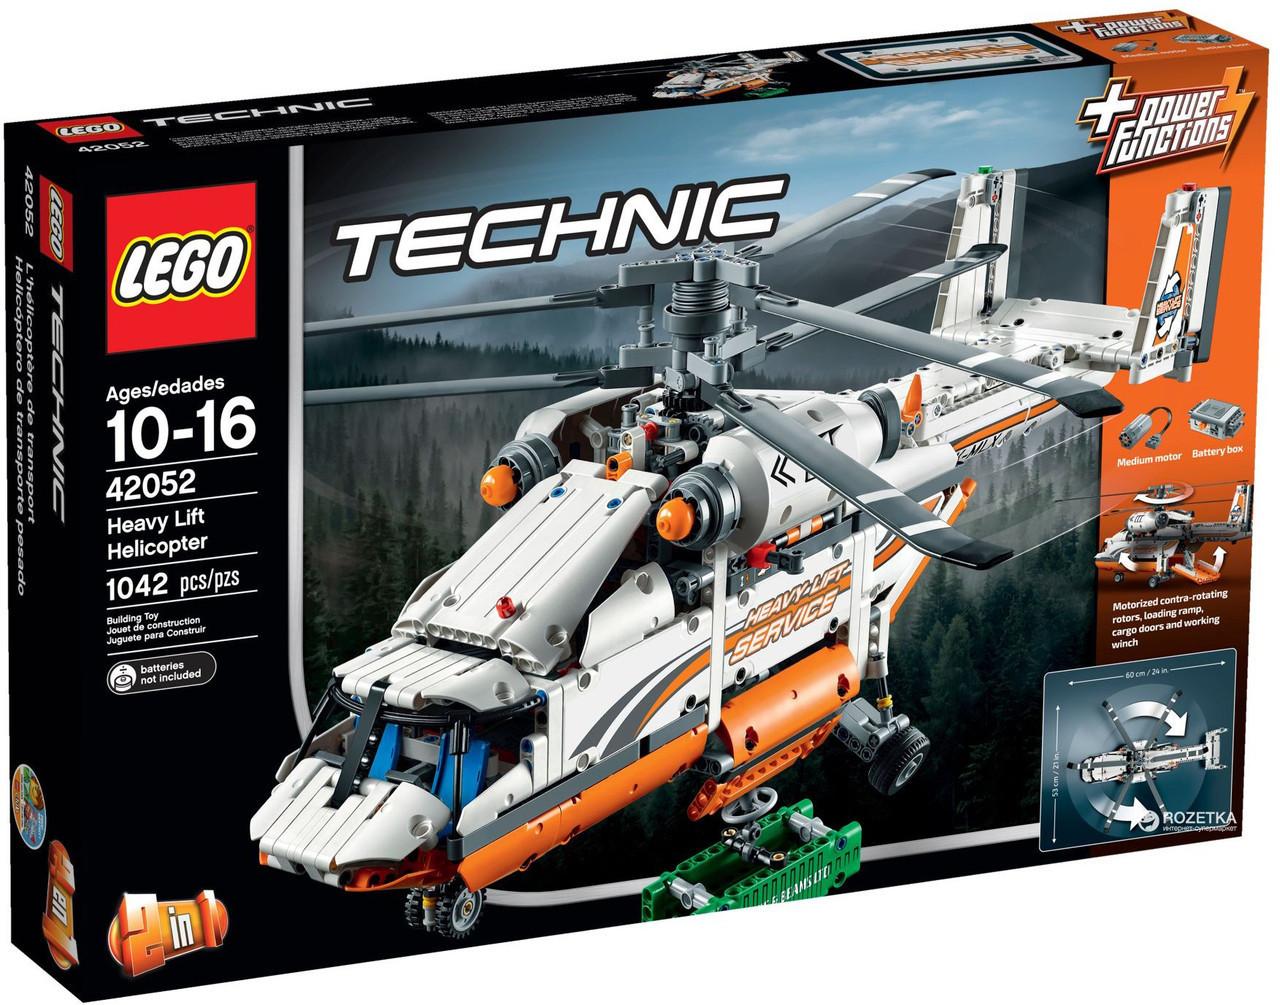 42052 Lego Technic Грузовой вертолет, Лего Техник